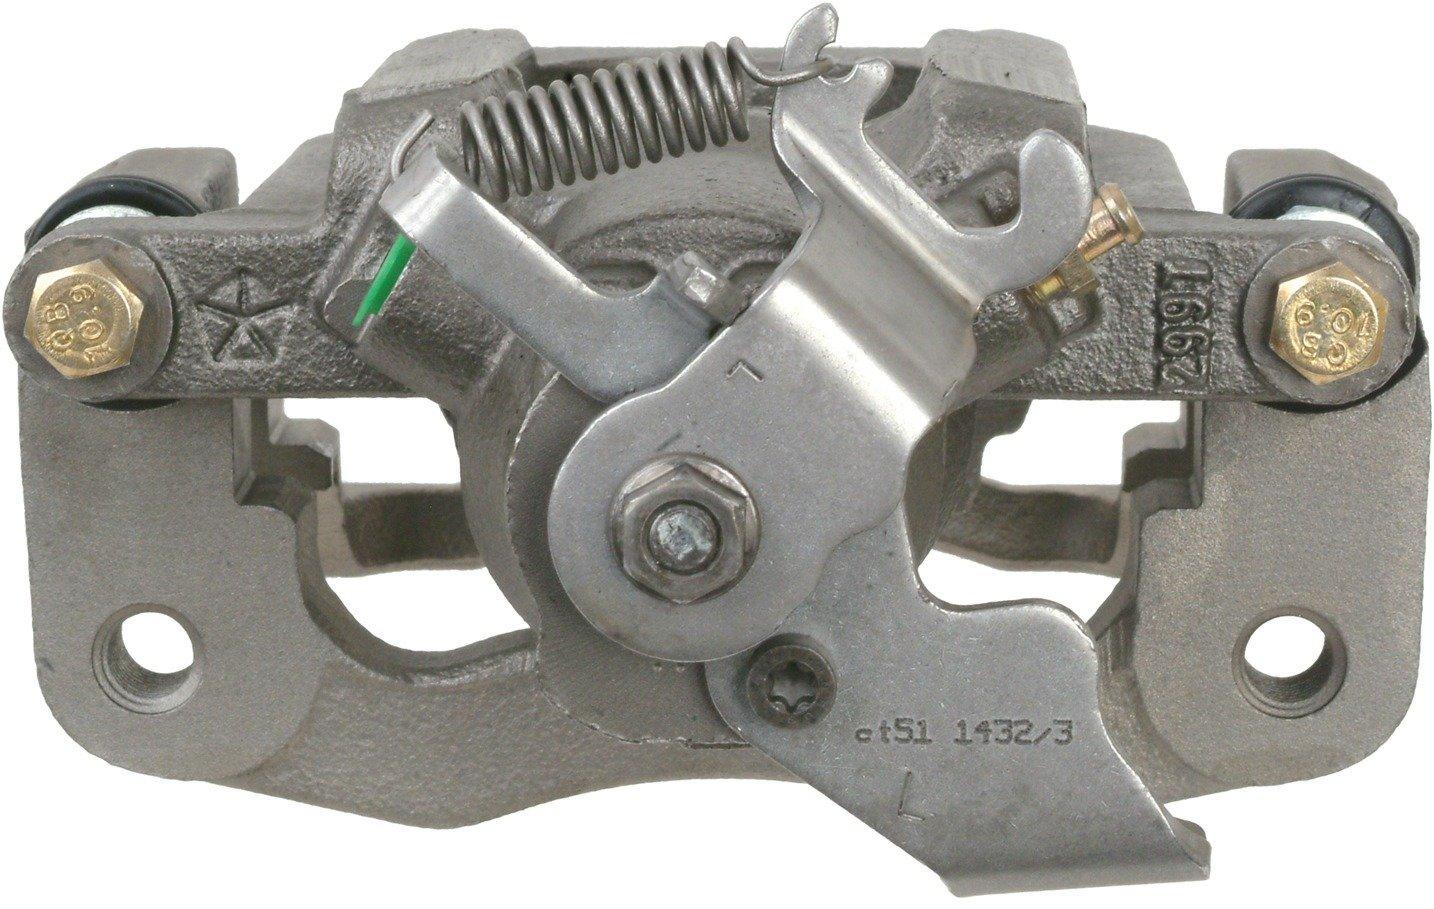 Cardone 18-B5081 Remanufactured Domestic Friction Ready (Unloaded) Brake Caliper